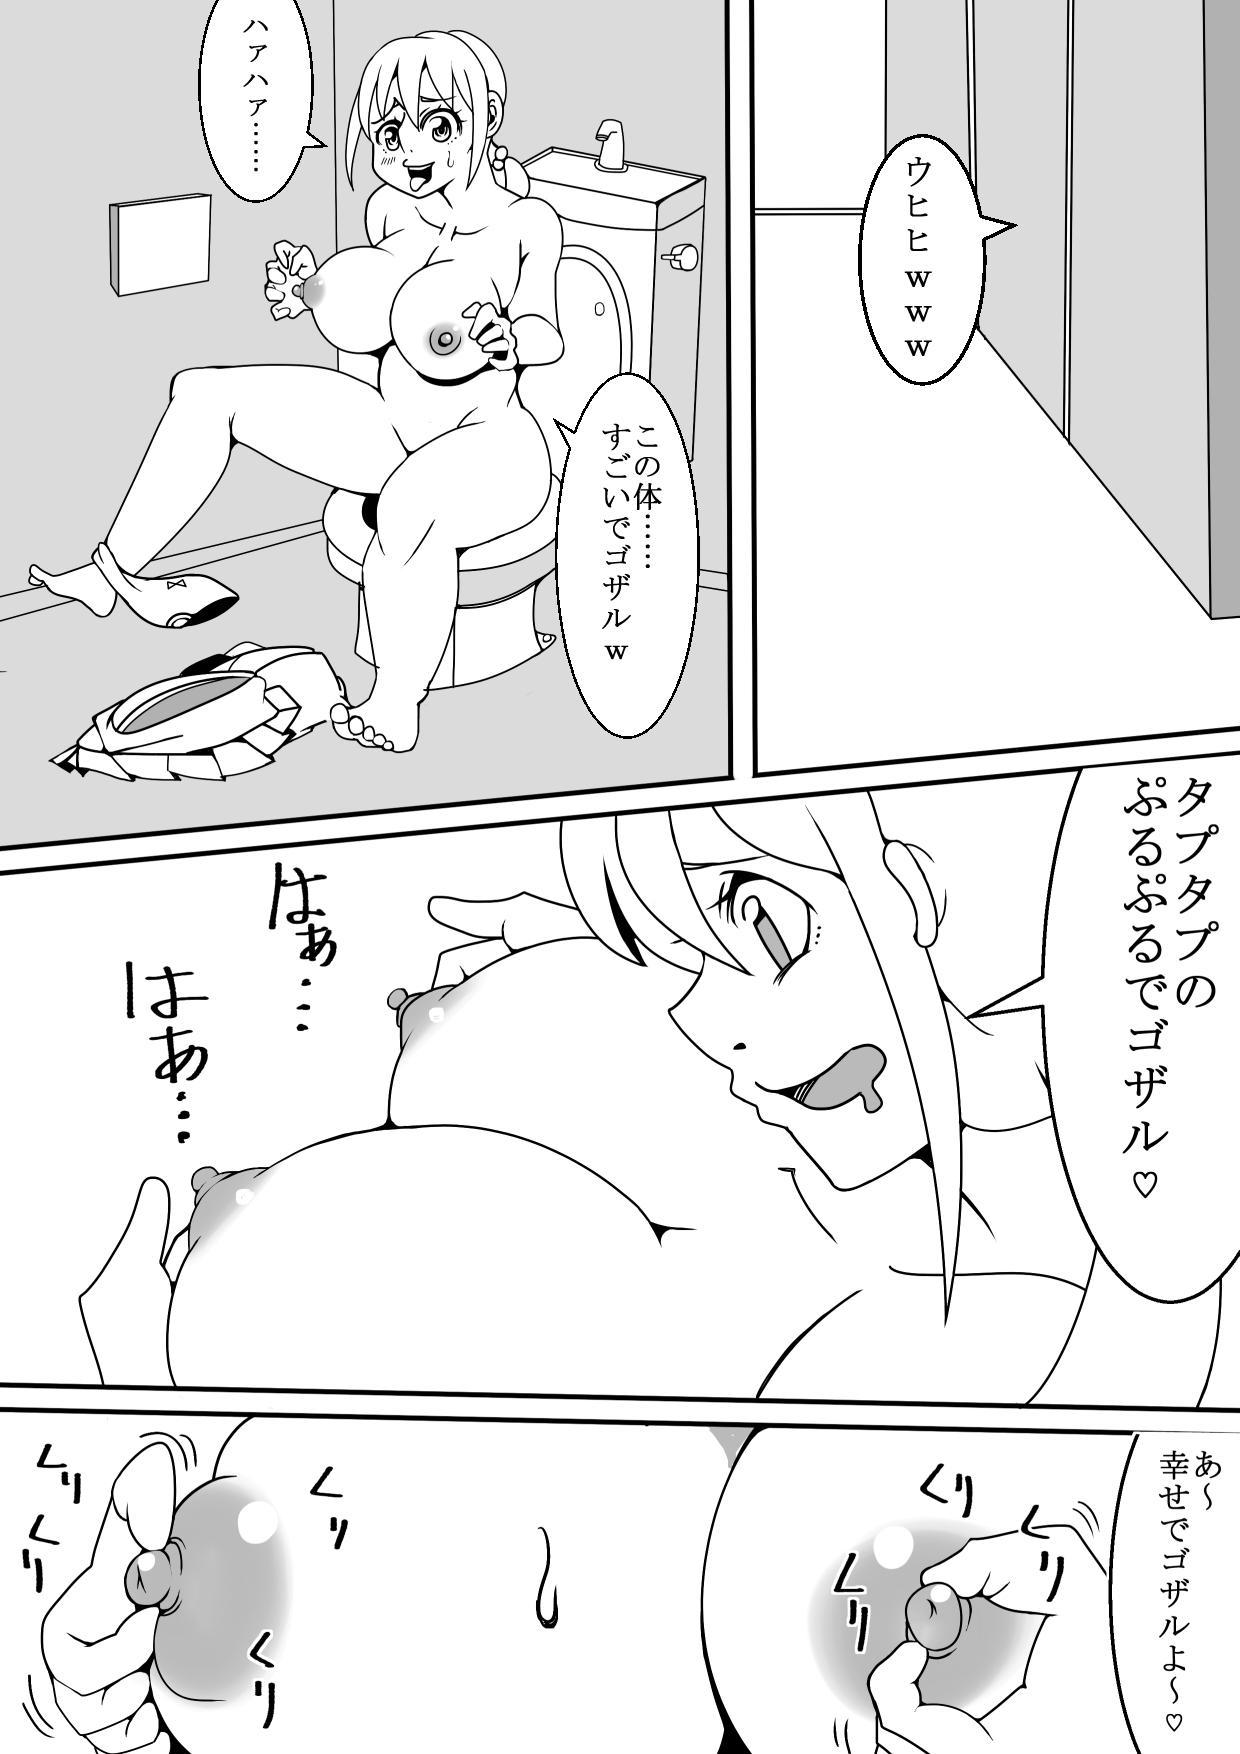 Kawaii JK to Kimoota ga Irekawari Sex 6